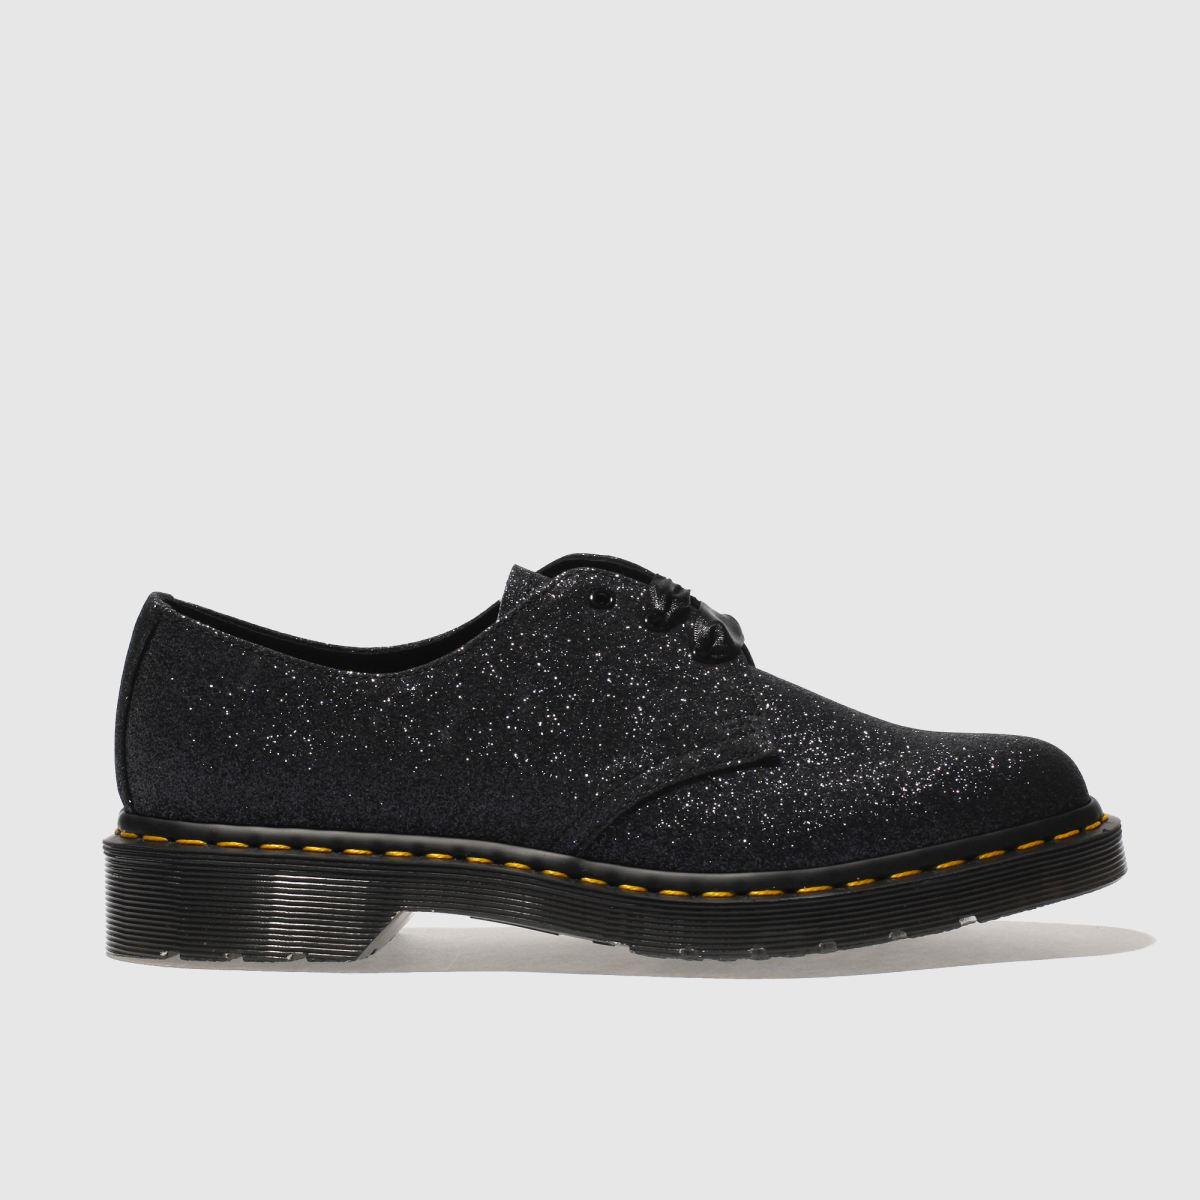 Dr Martens Black 1461 Glitter 3 Eye Flat Shoes